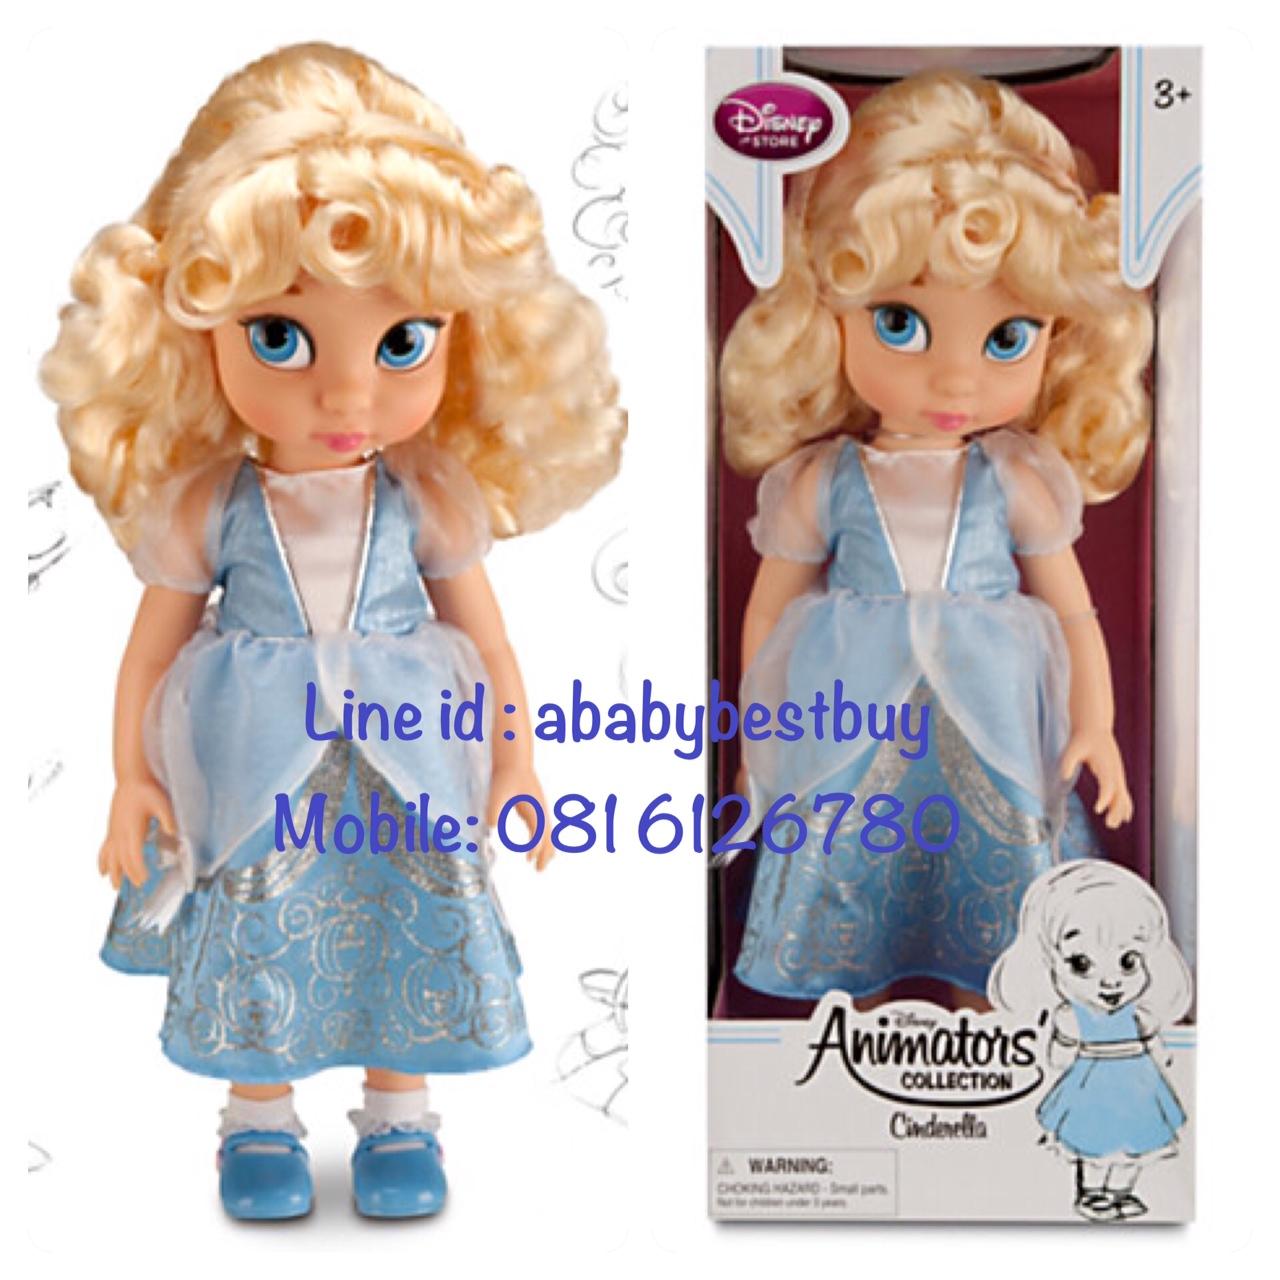 z Disney Animators' Collection Cinderella Doll - 16'' รุ่นใหม่ (พร้อมส่ง) ตุ๊กตาดีสนีย์ แอนิเมเตอร์ เจ้าหญิงซินเดอเรล่า รุ่นใหม่ รุ่น2 (รุ่นสอง)